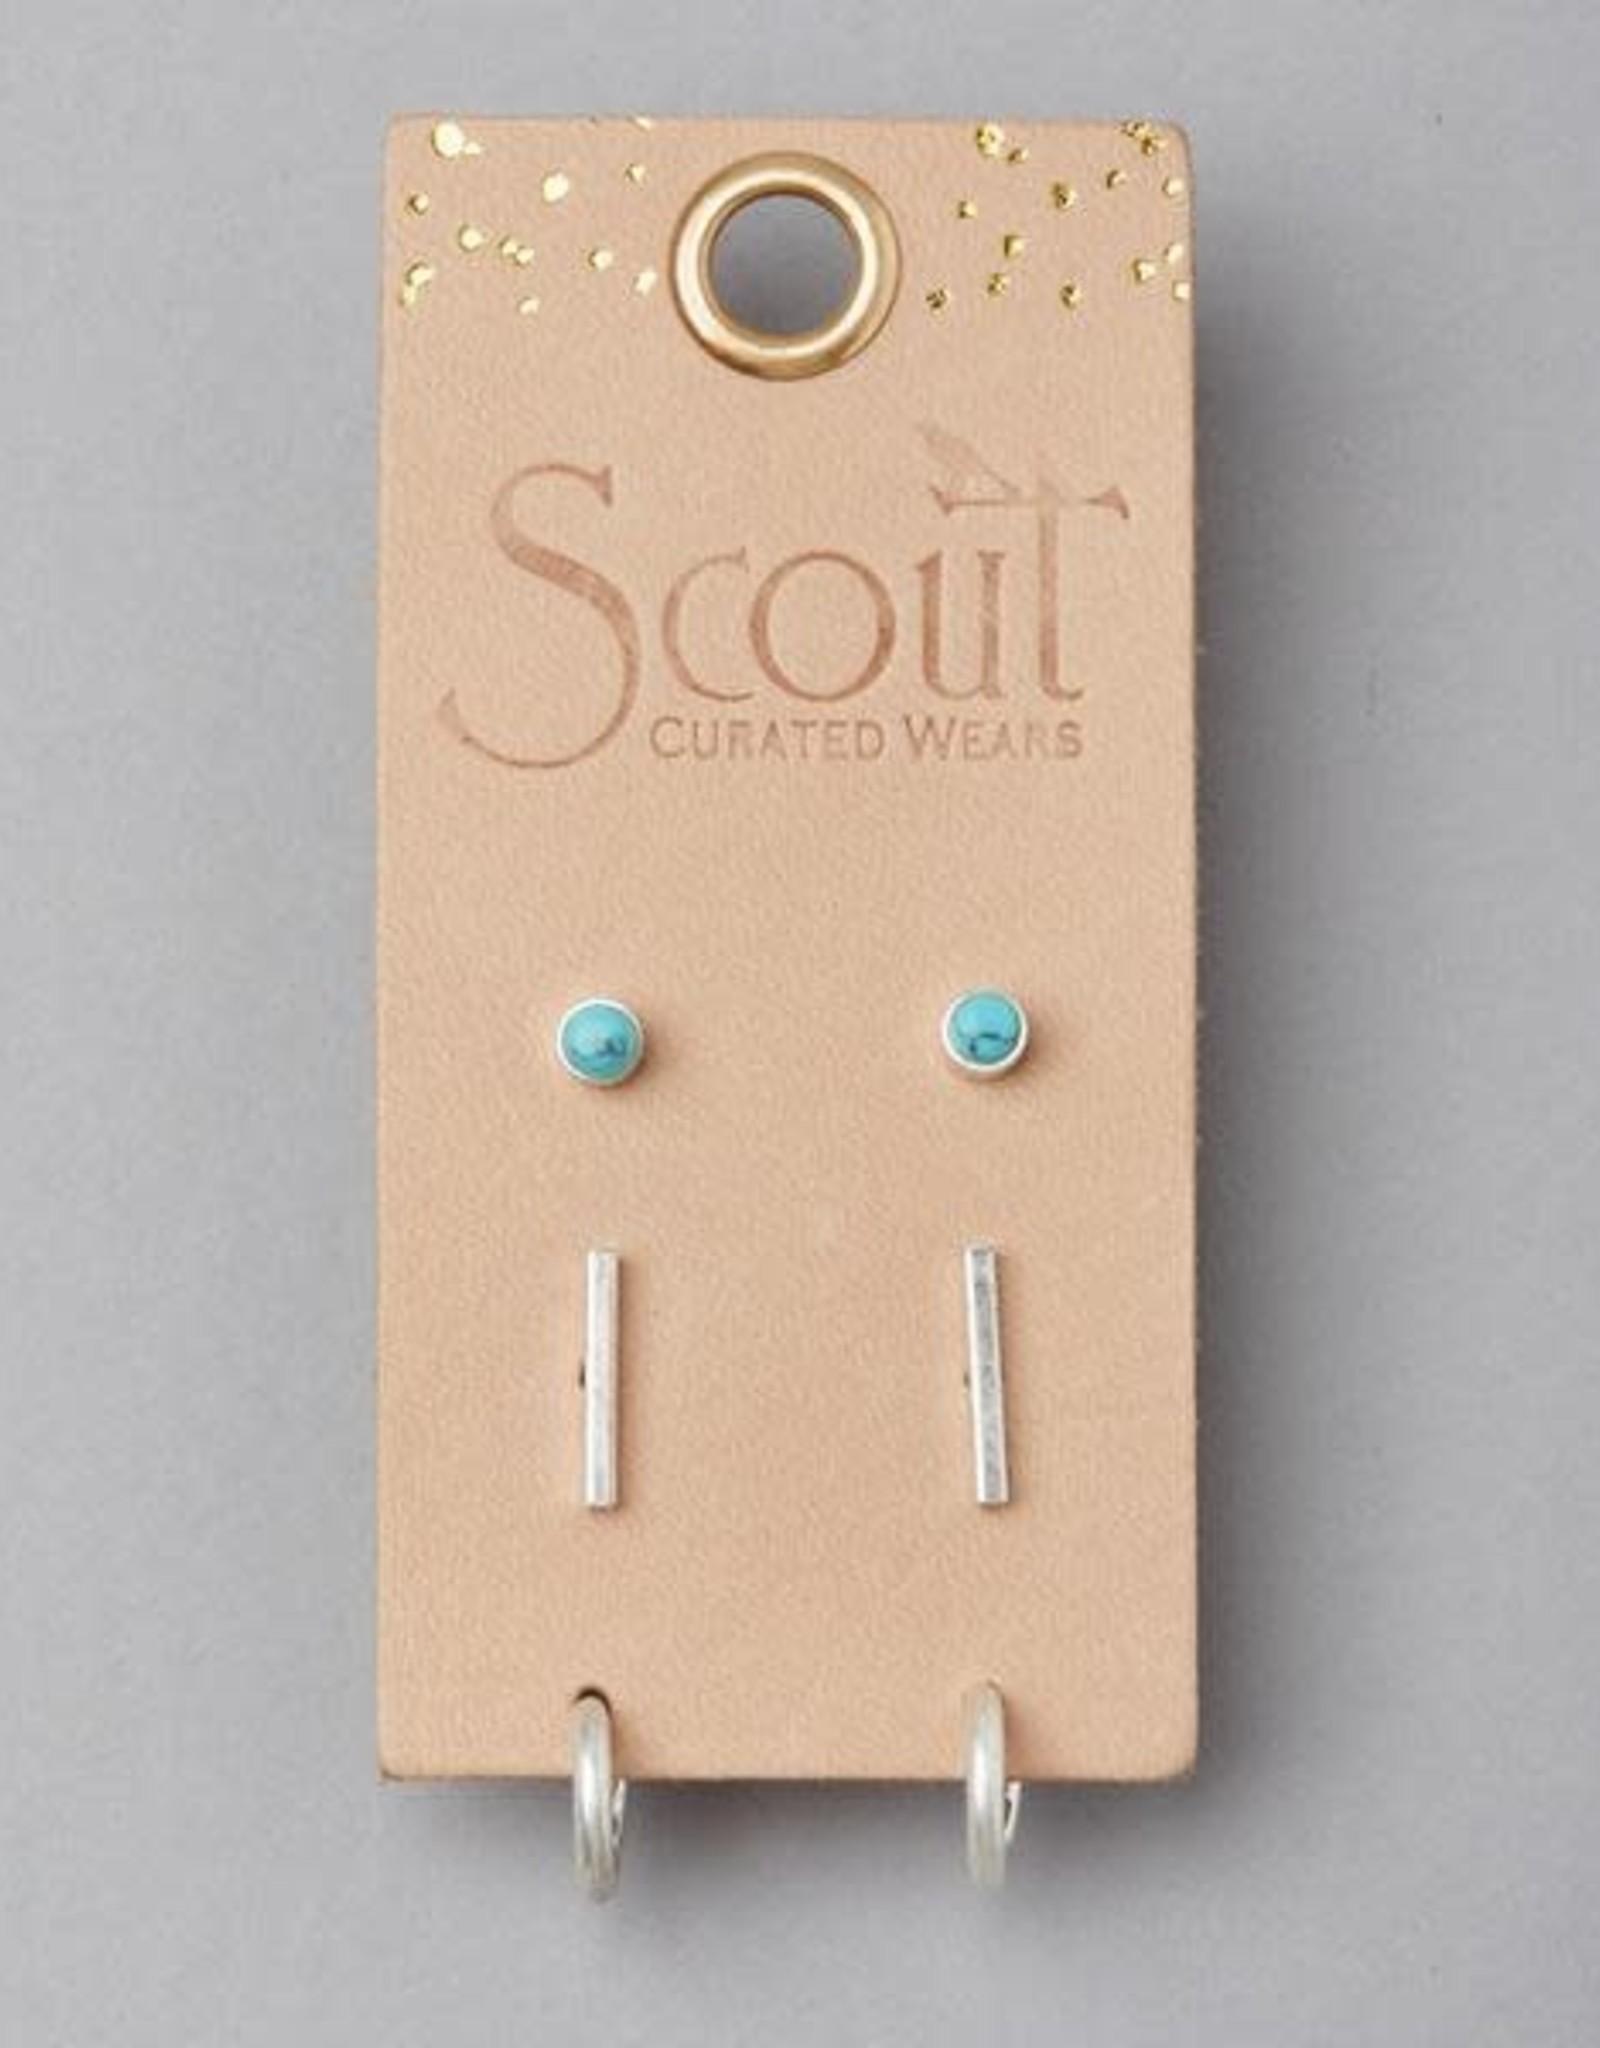 Scout Curated Wears Scout   Scarlett Stud Trio Earring Set - silver